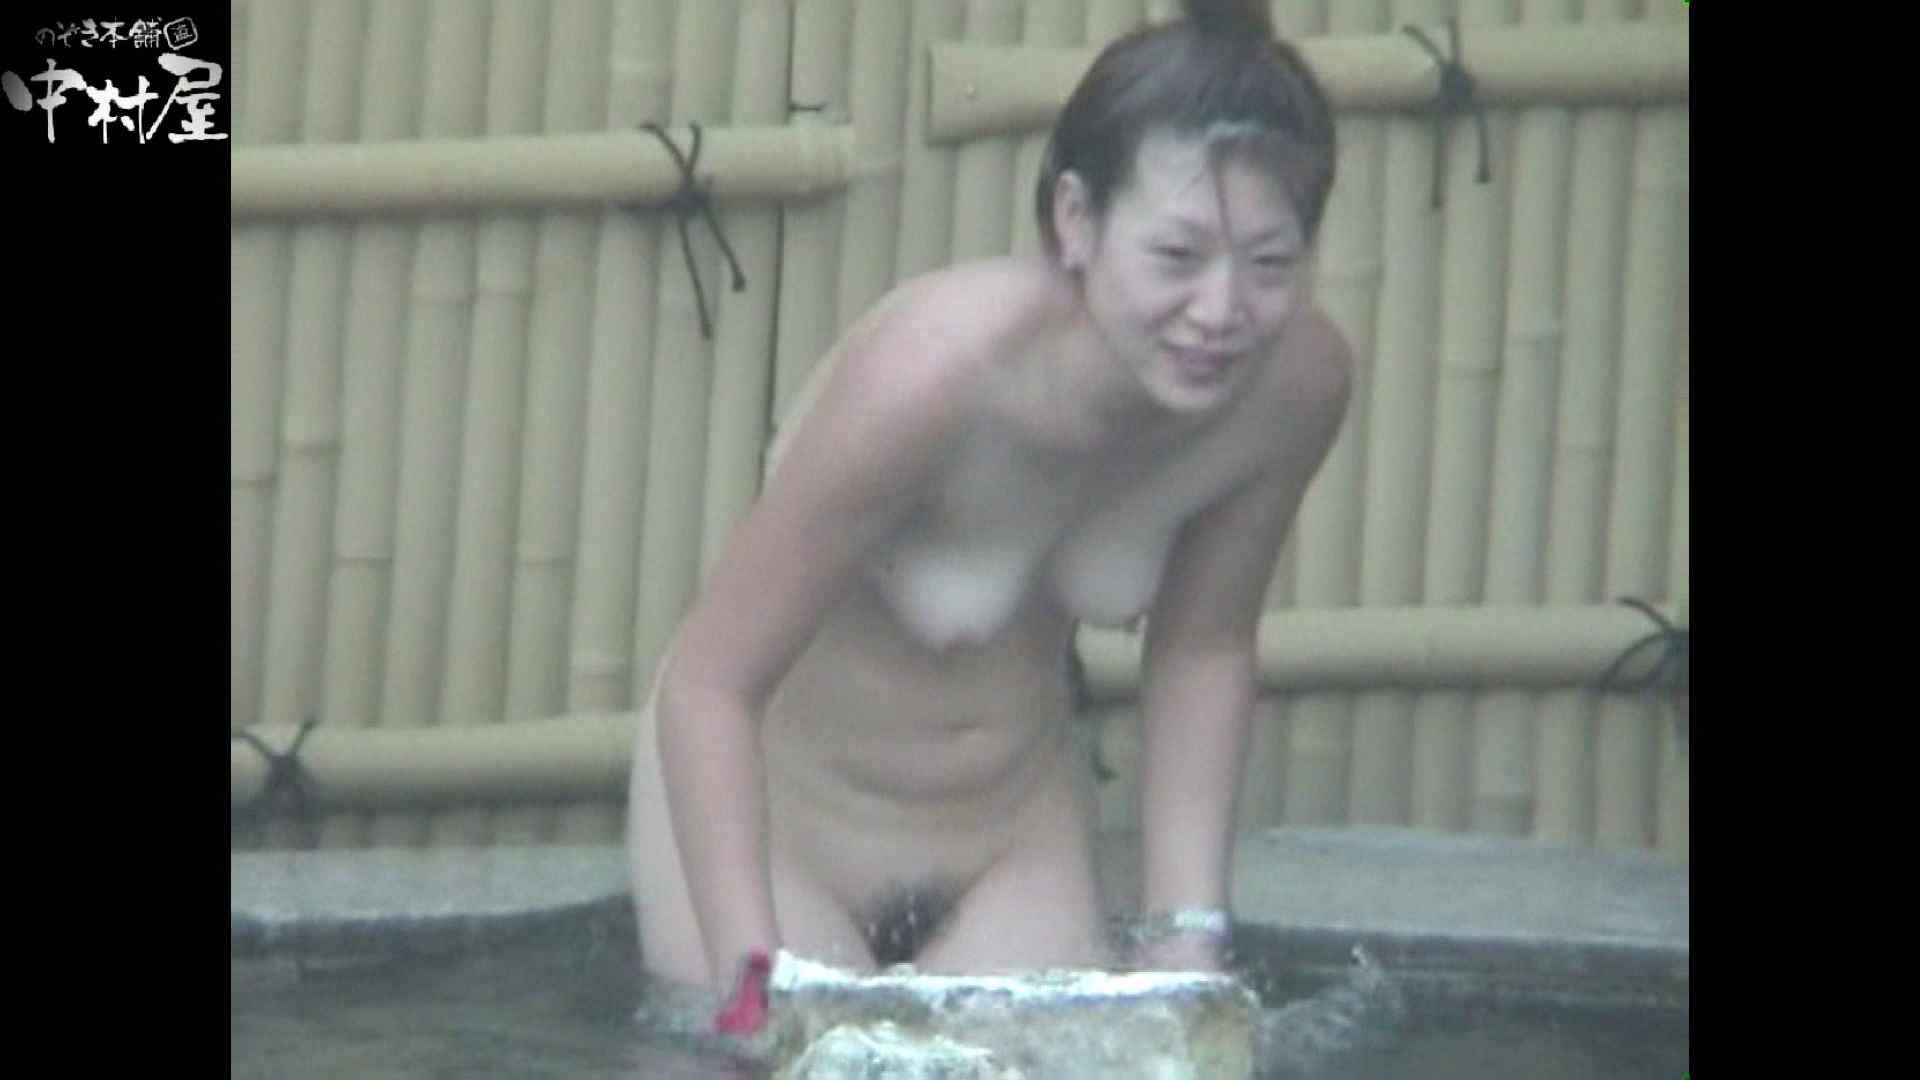 Aquaな露天風呂Vol.974 盗撮シリーズ | 露天風呂編  104PIX 15